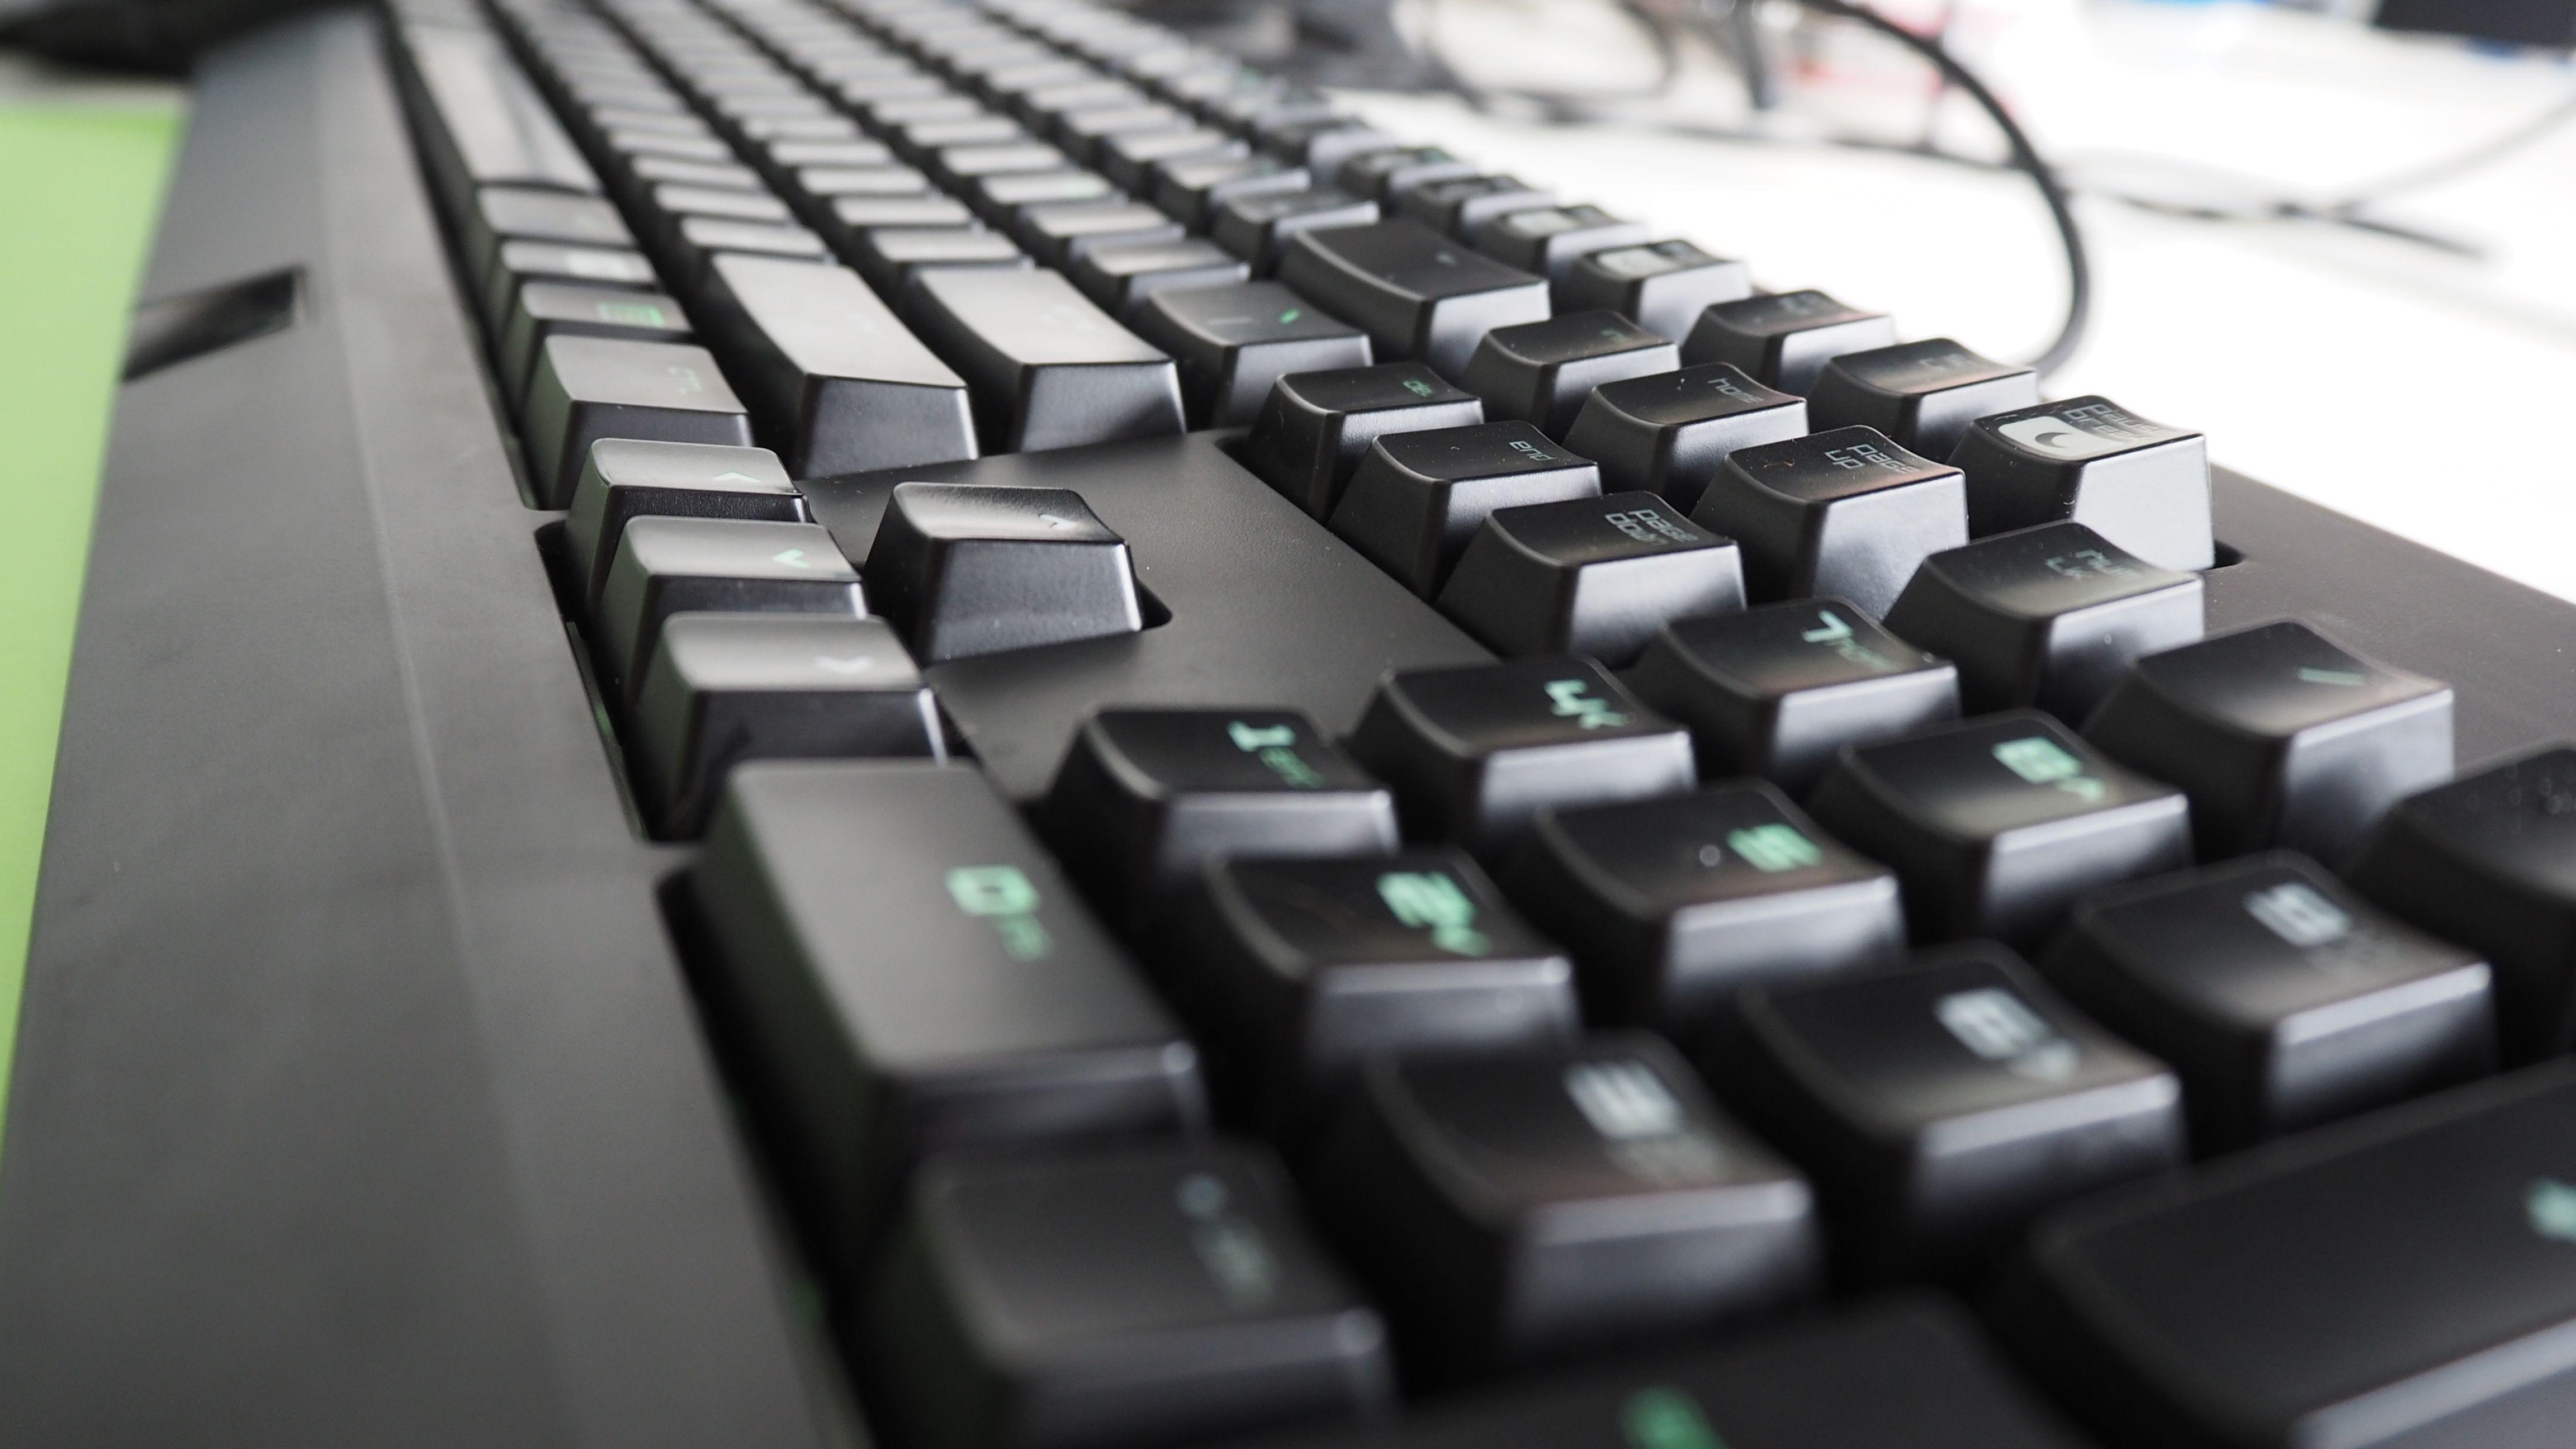 Pin by Beardedbob on Gaming Computer keyboard